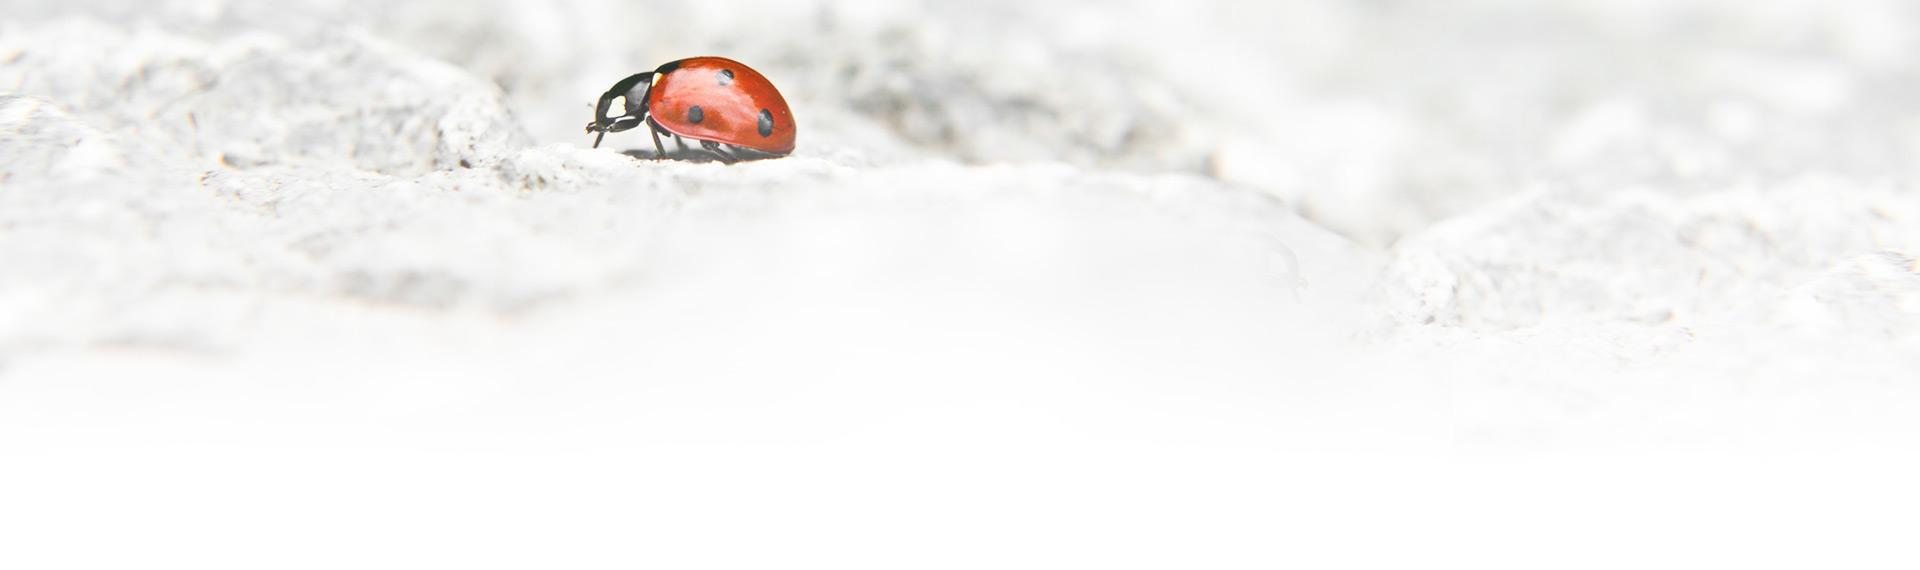 biedronka na kamieniu